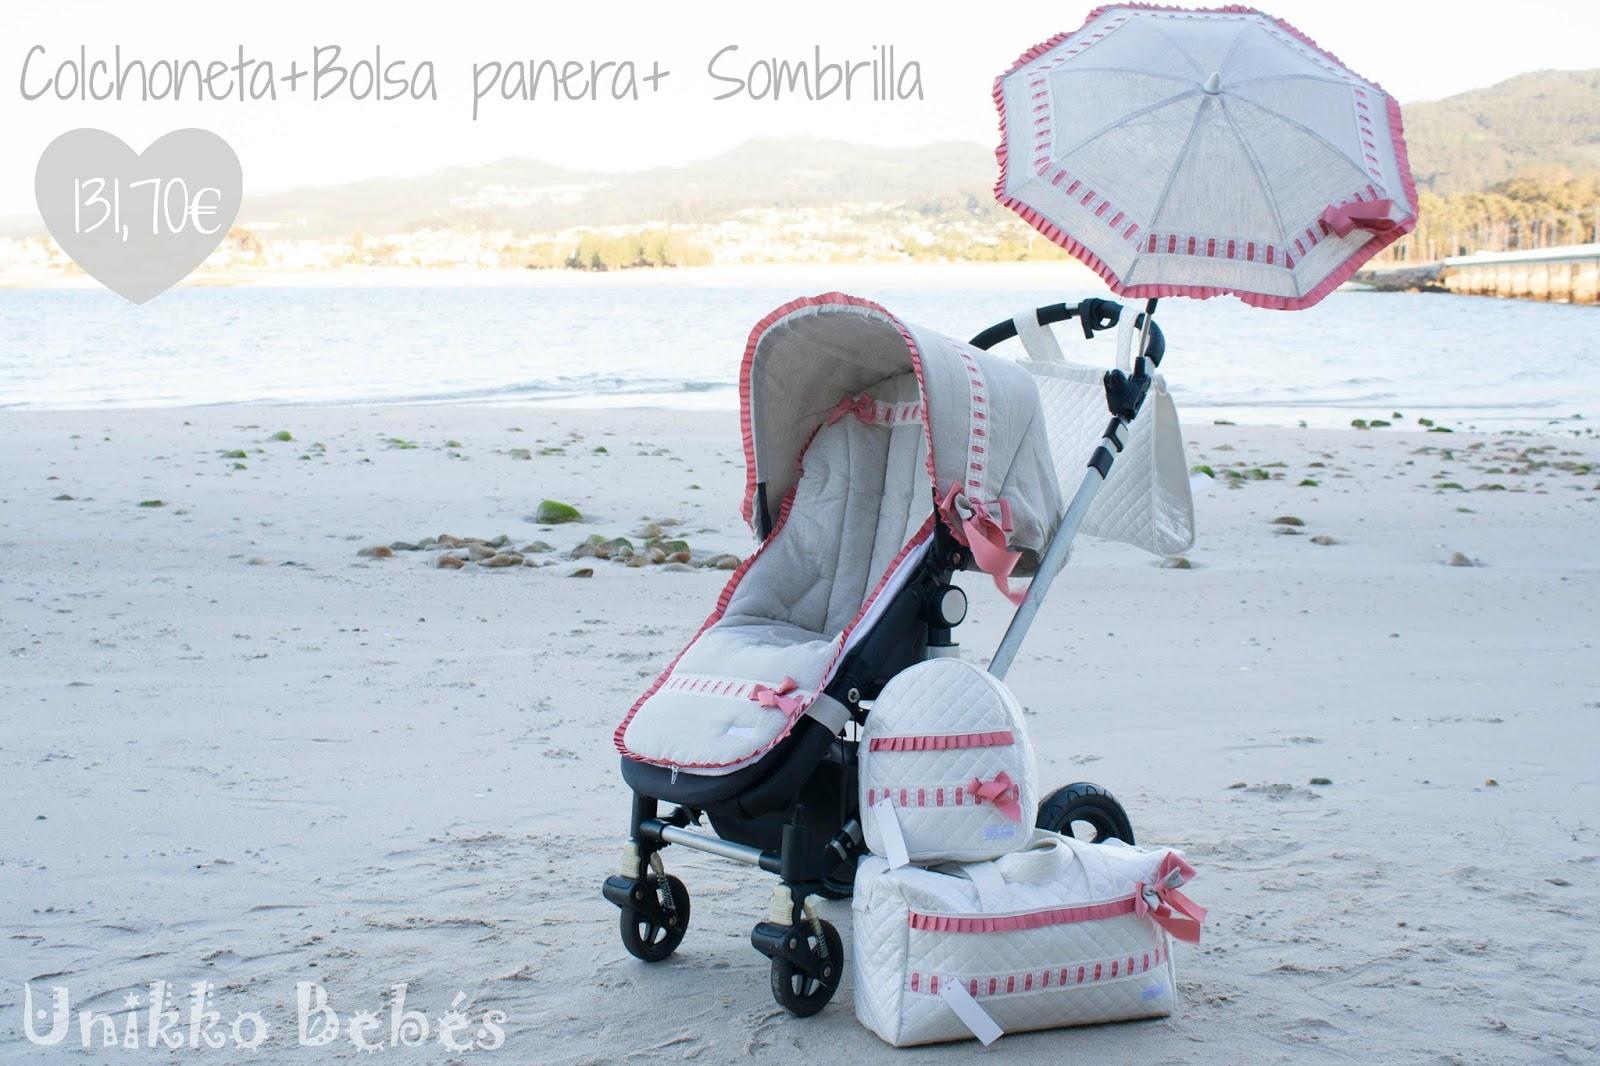 Funda de verano para silla de paseo unikko beb s sacos de silla mochilas infantiles bolsos - Funda silla paseo ...